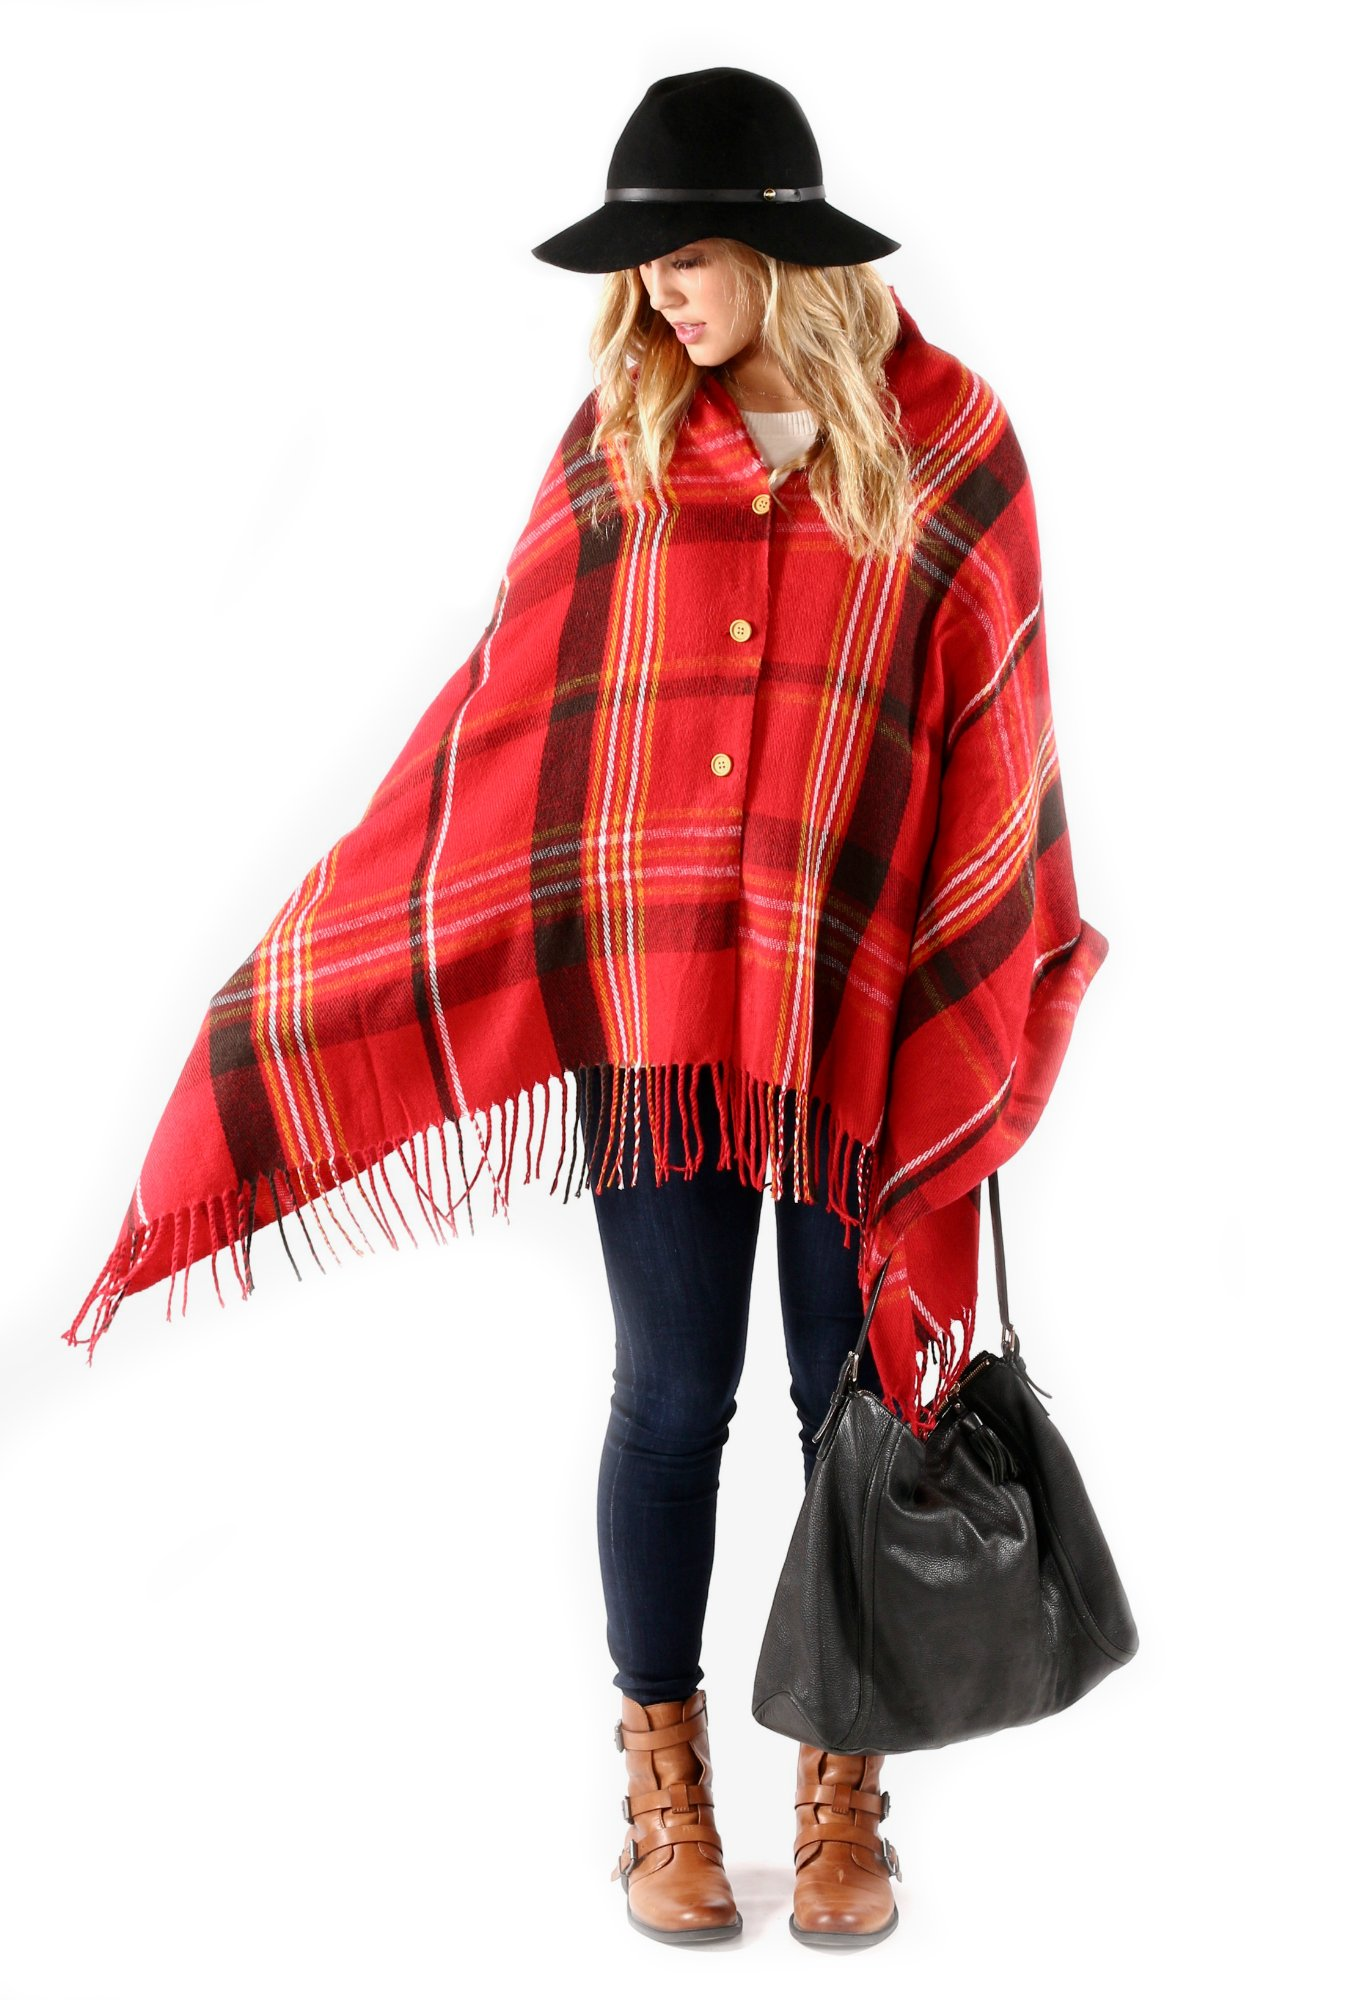 FLASH SALE - Pretty Simple Plaid Button Blanket Scarf Shawl Women's Wrap (Red)